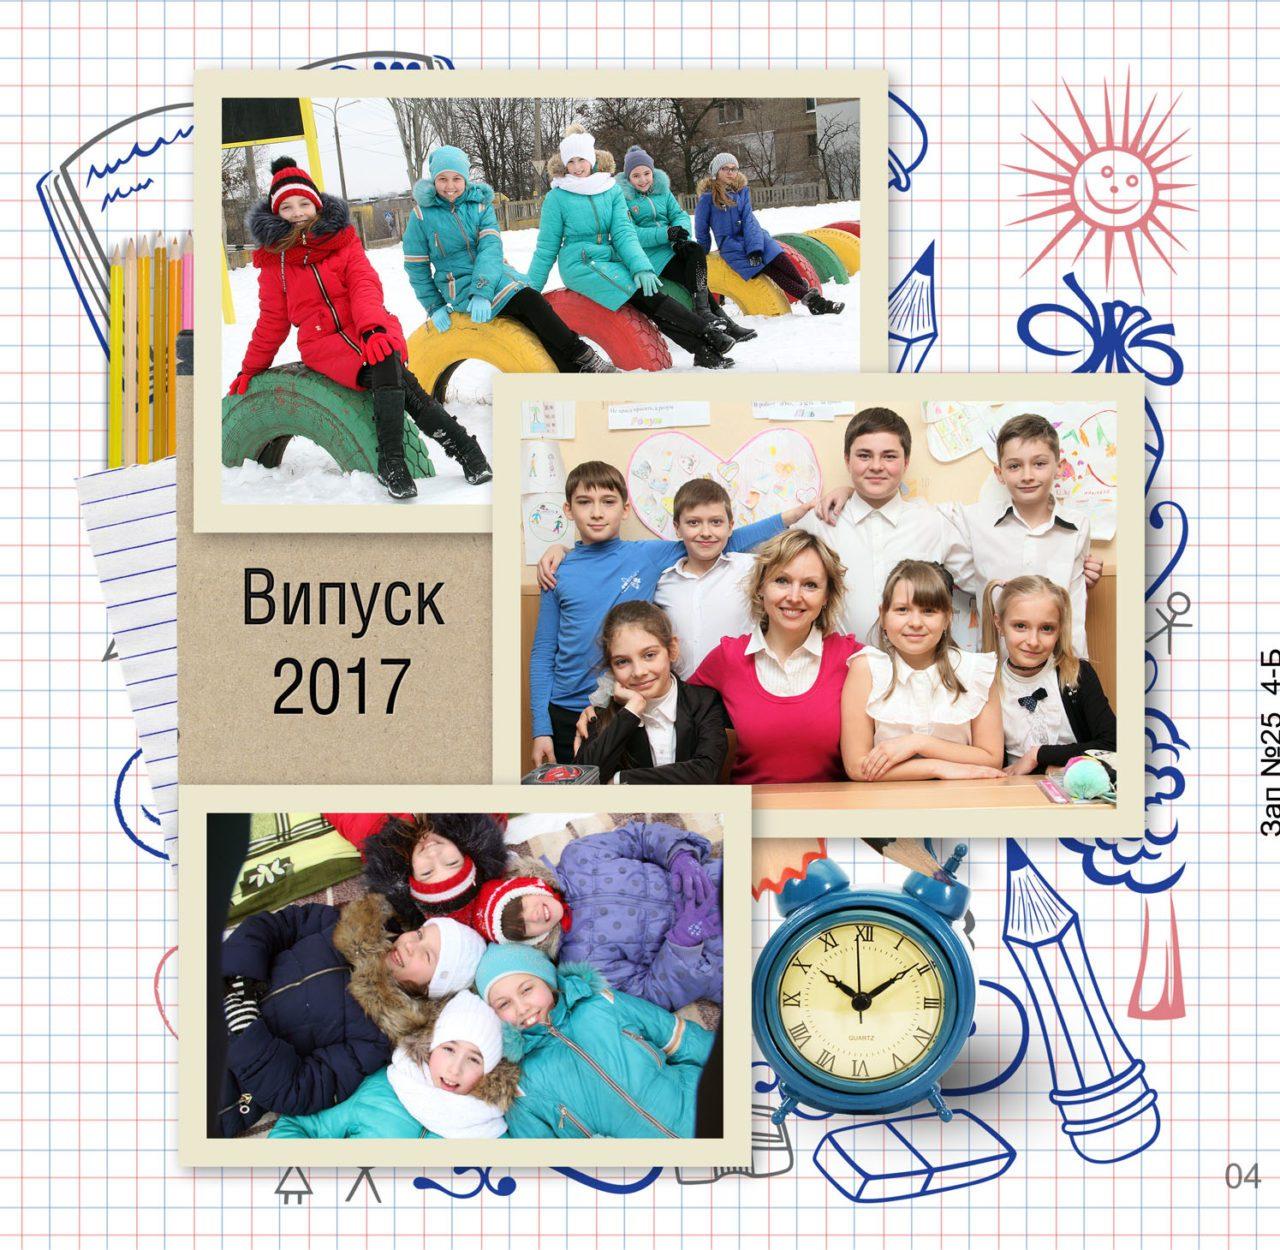 https://school-photo.com.ua/wp-content/uploads/2017/07/04-5-1280x1250.jpg